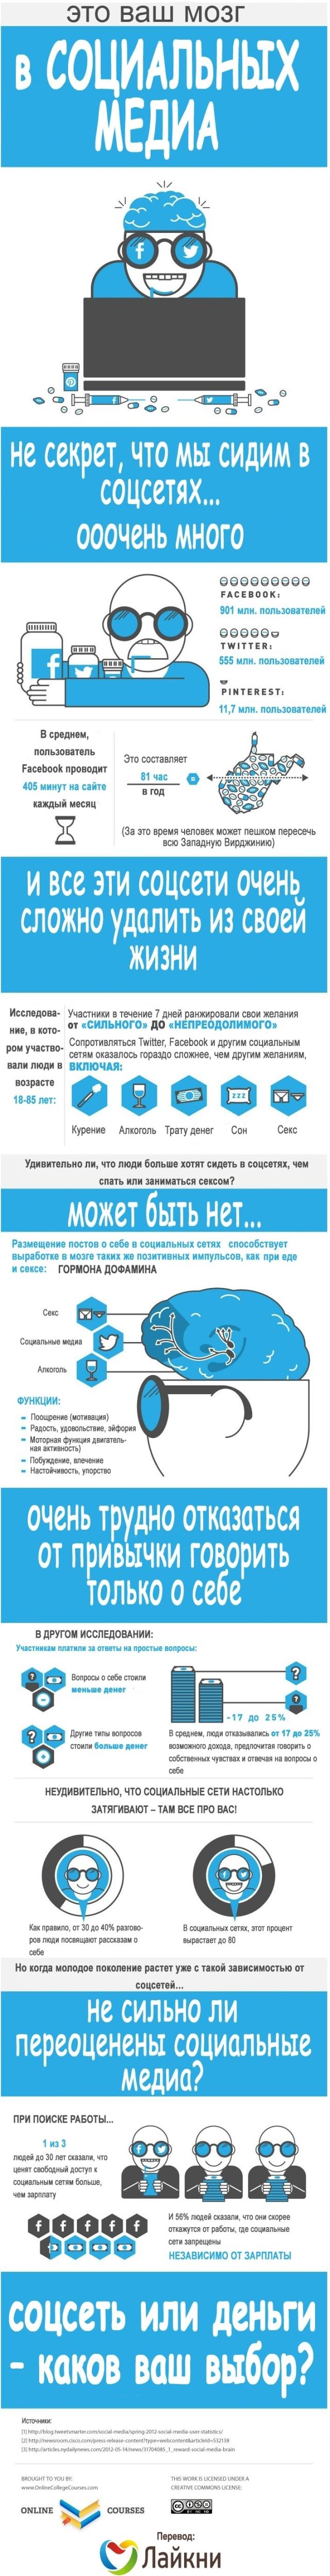 vash-mozg-v-socialnyh-media